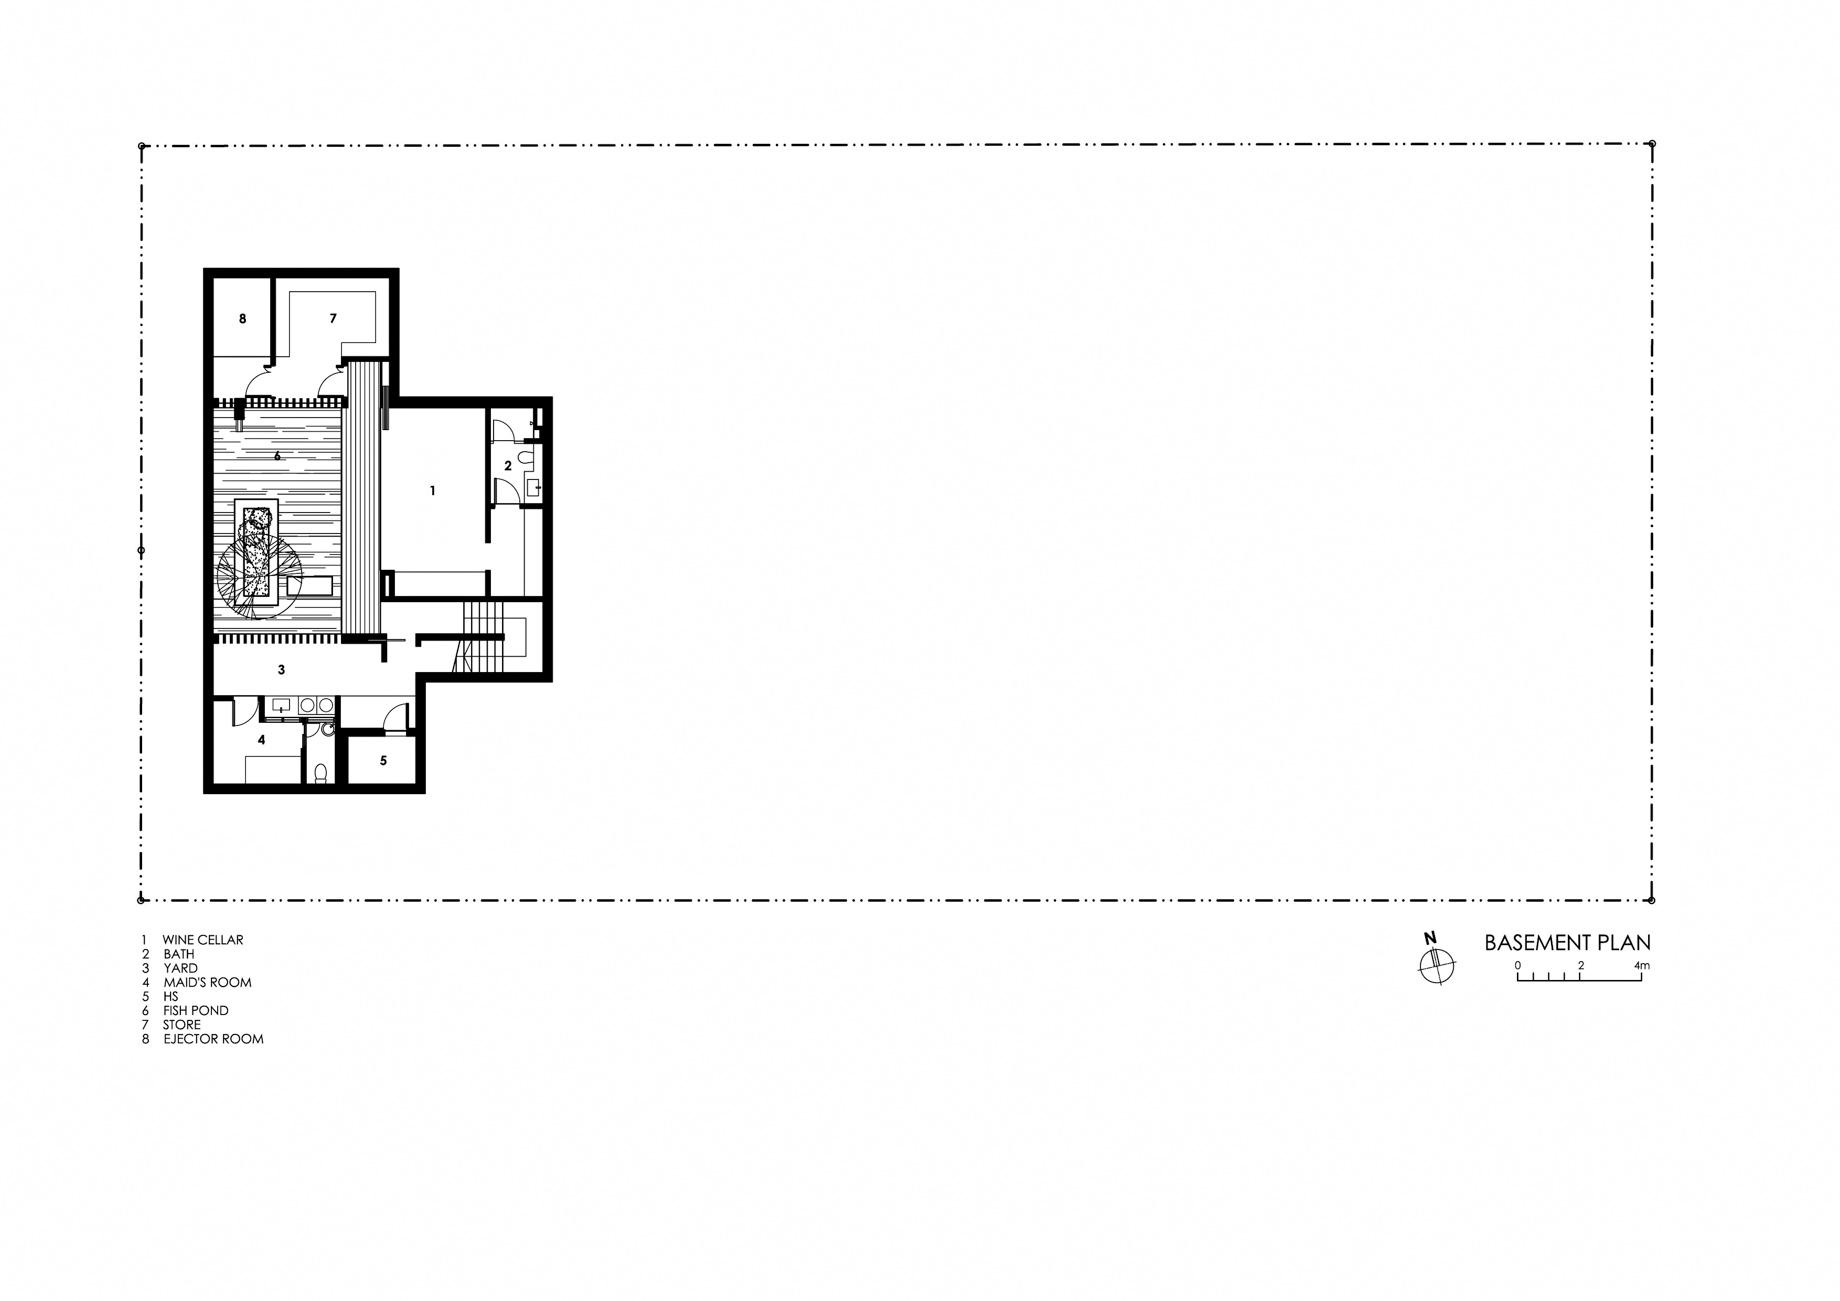 Basement Floor Plan - Enclosed Open House Luxury Residence - Ramsgate Rd, Singapore